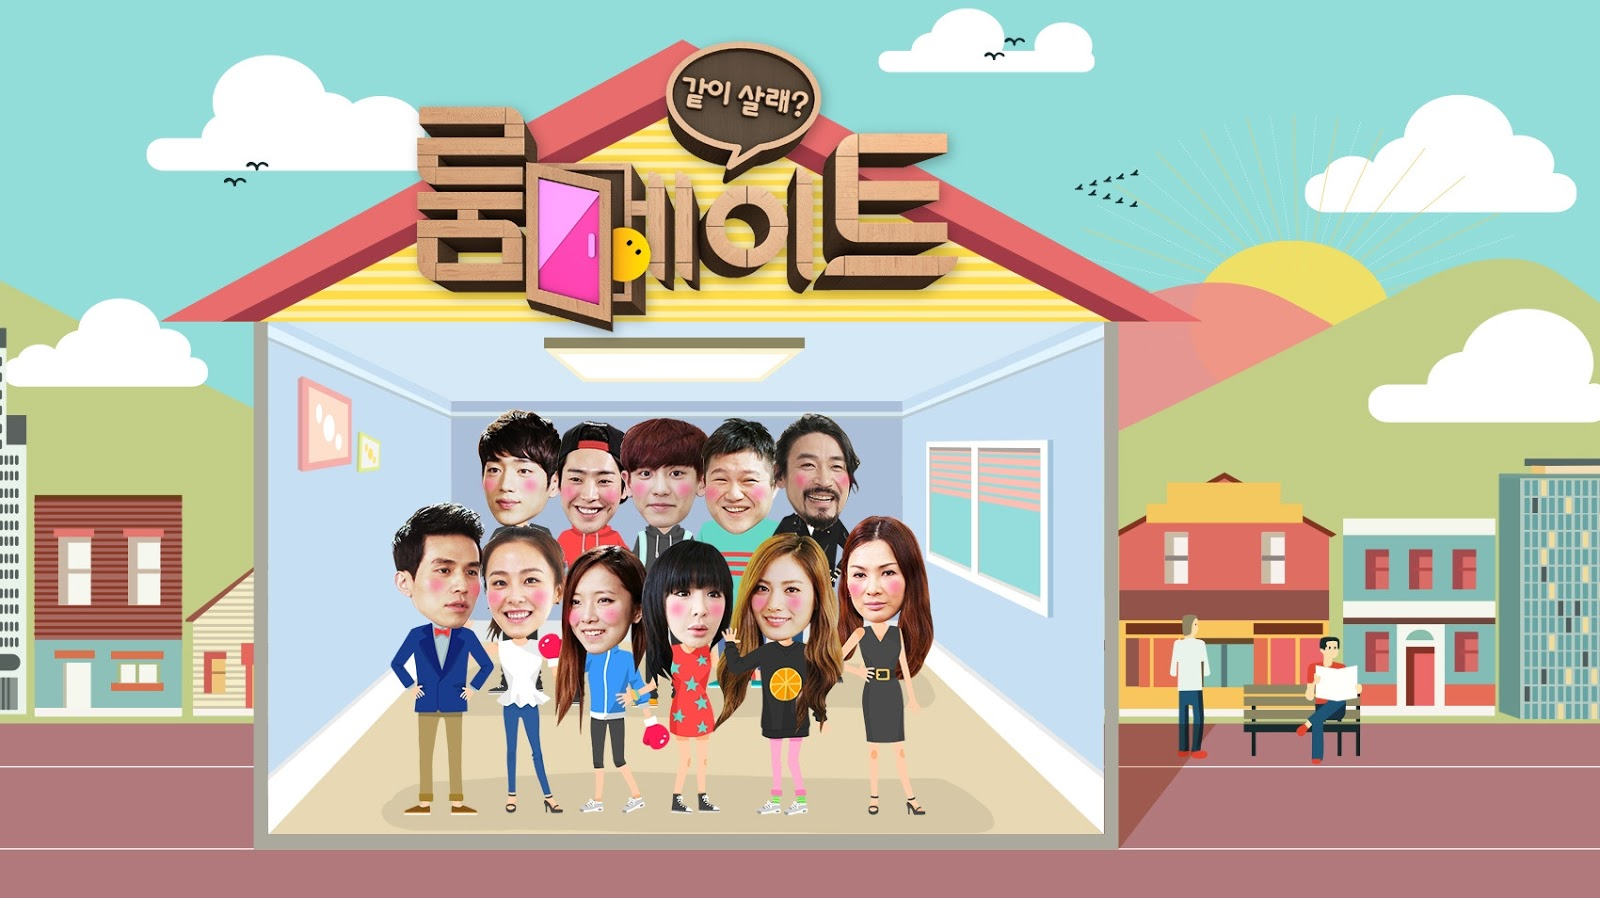 SBS Roommate Season 1-2 ตอนที่ 1-46 ซับไทย [จบ] – HD Full EP